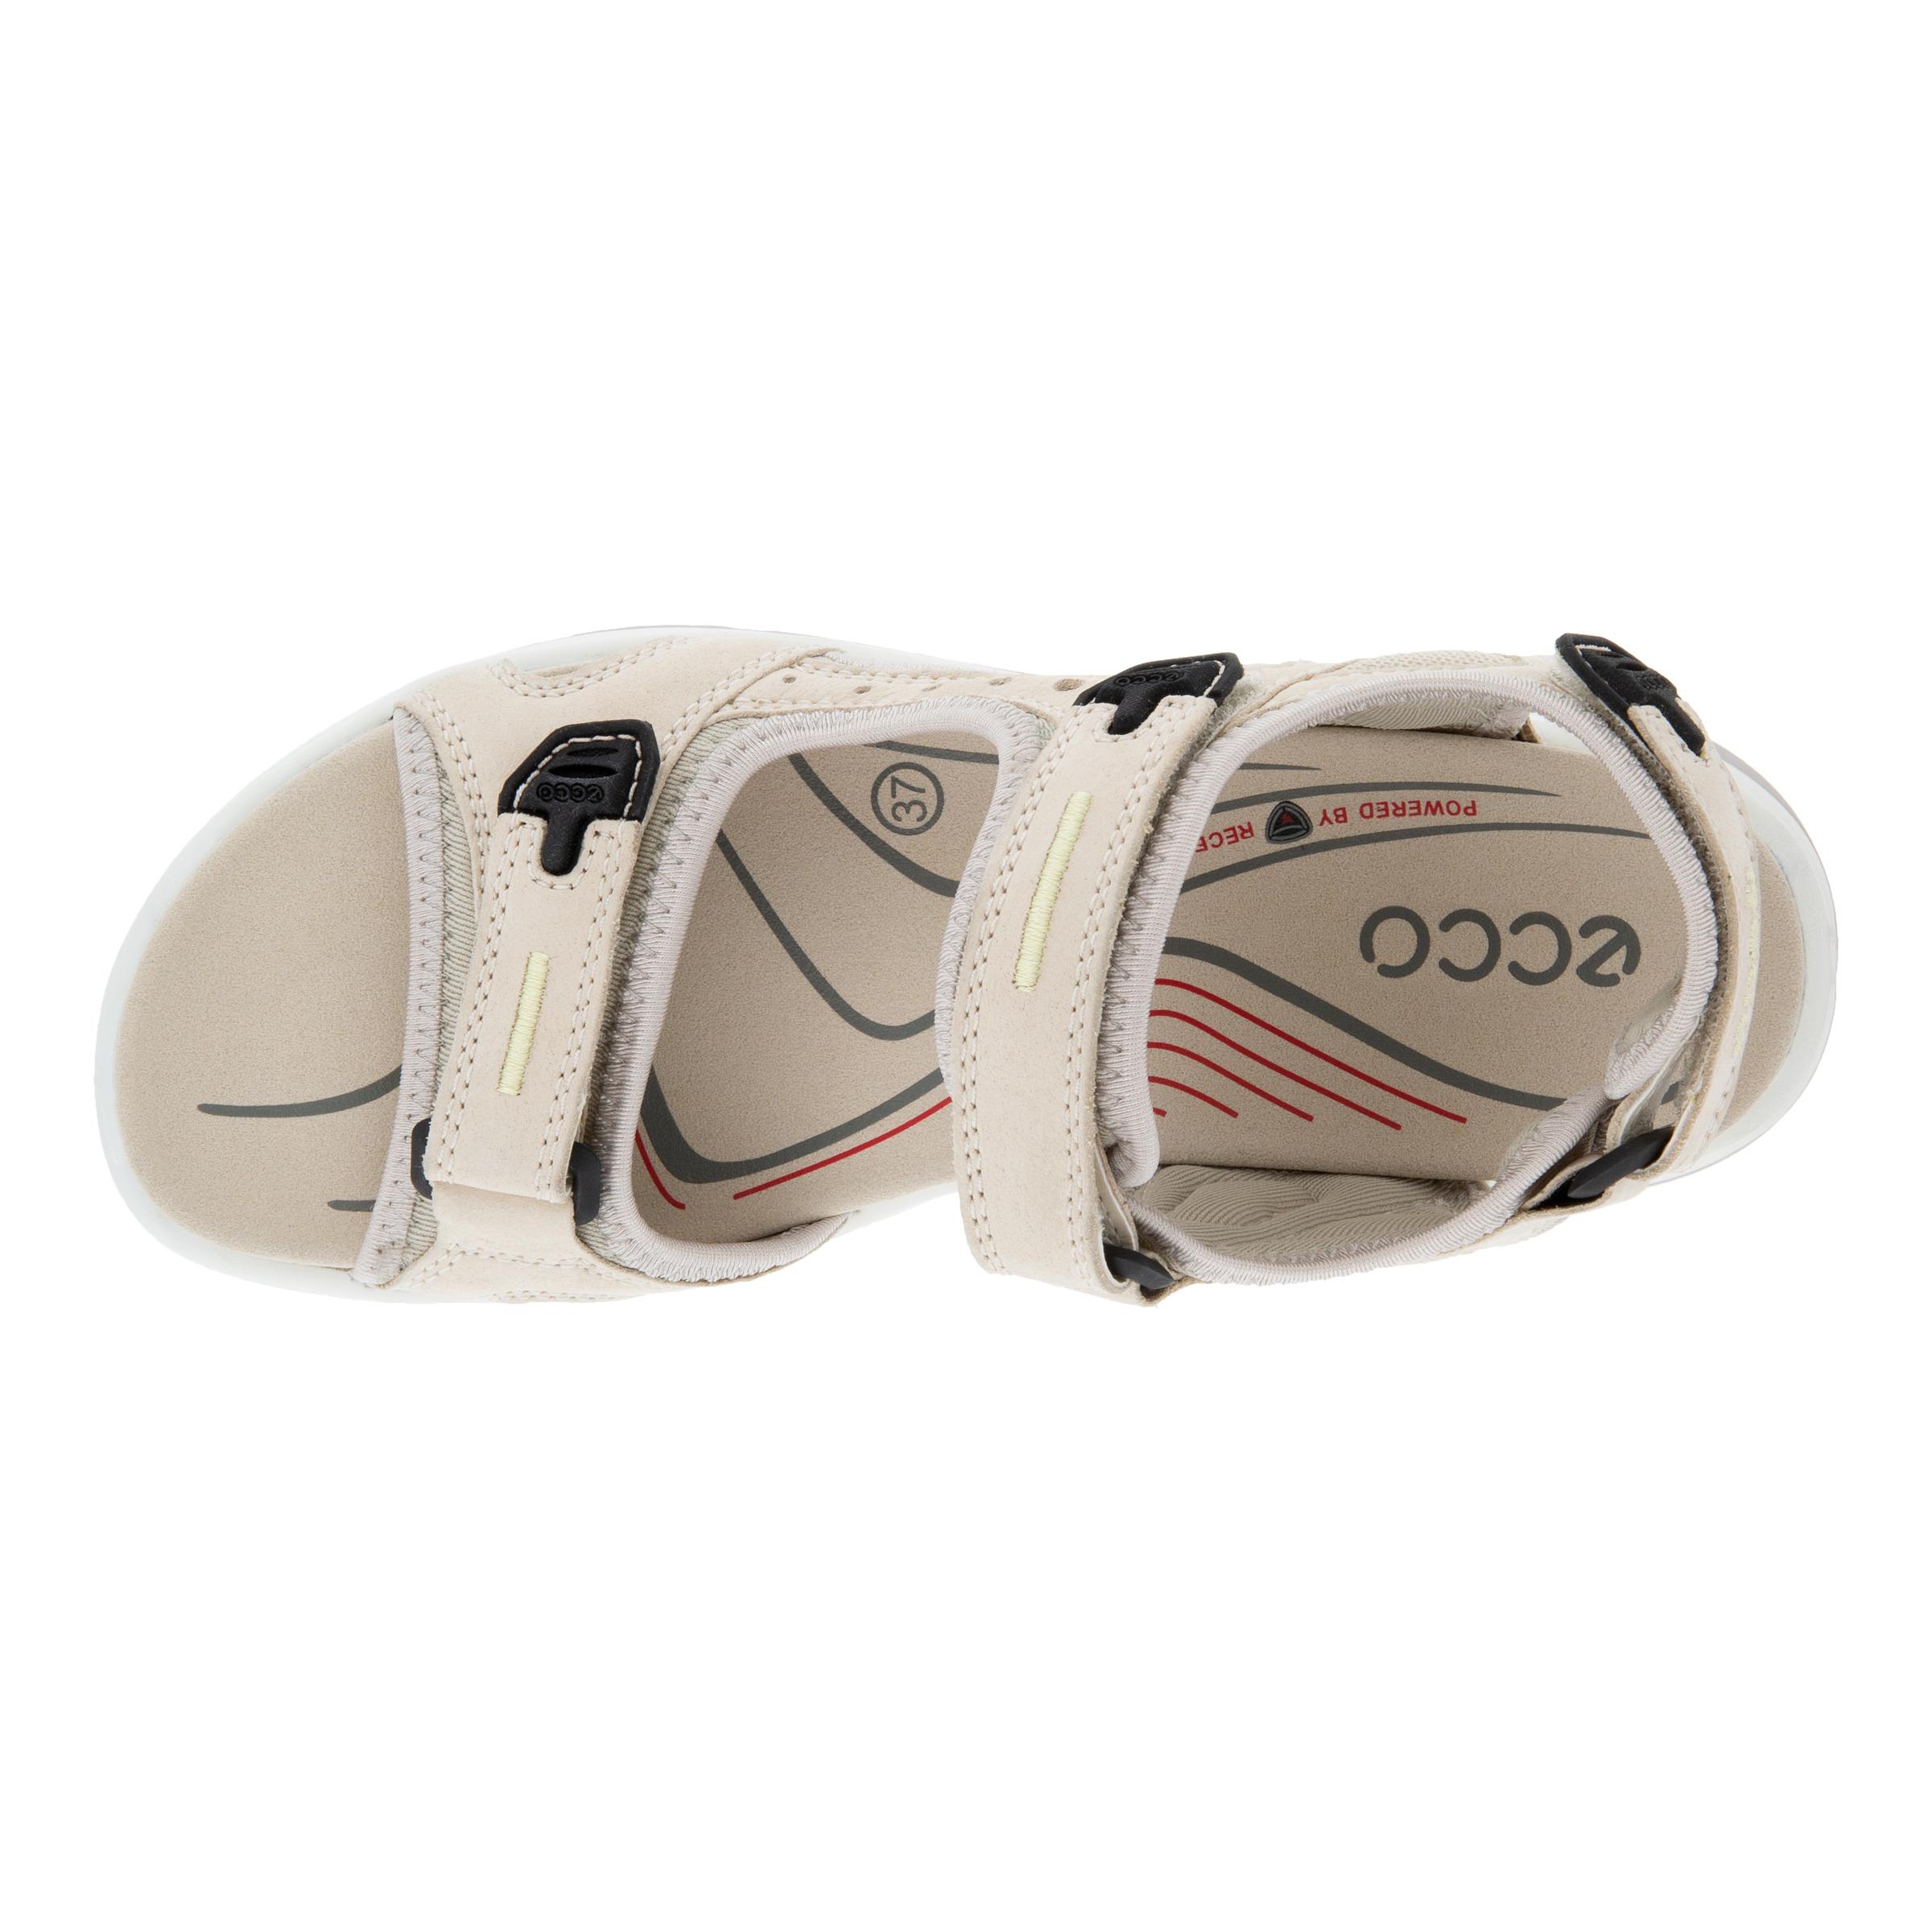 Ecco Offroad sandal, limestone, 40